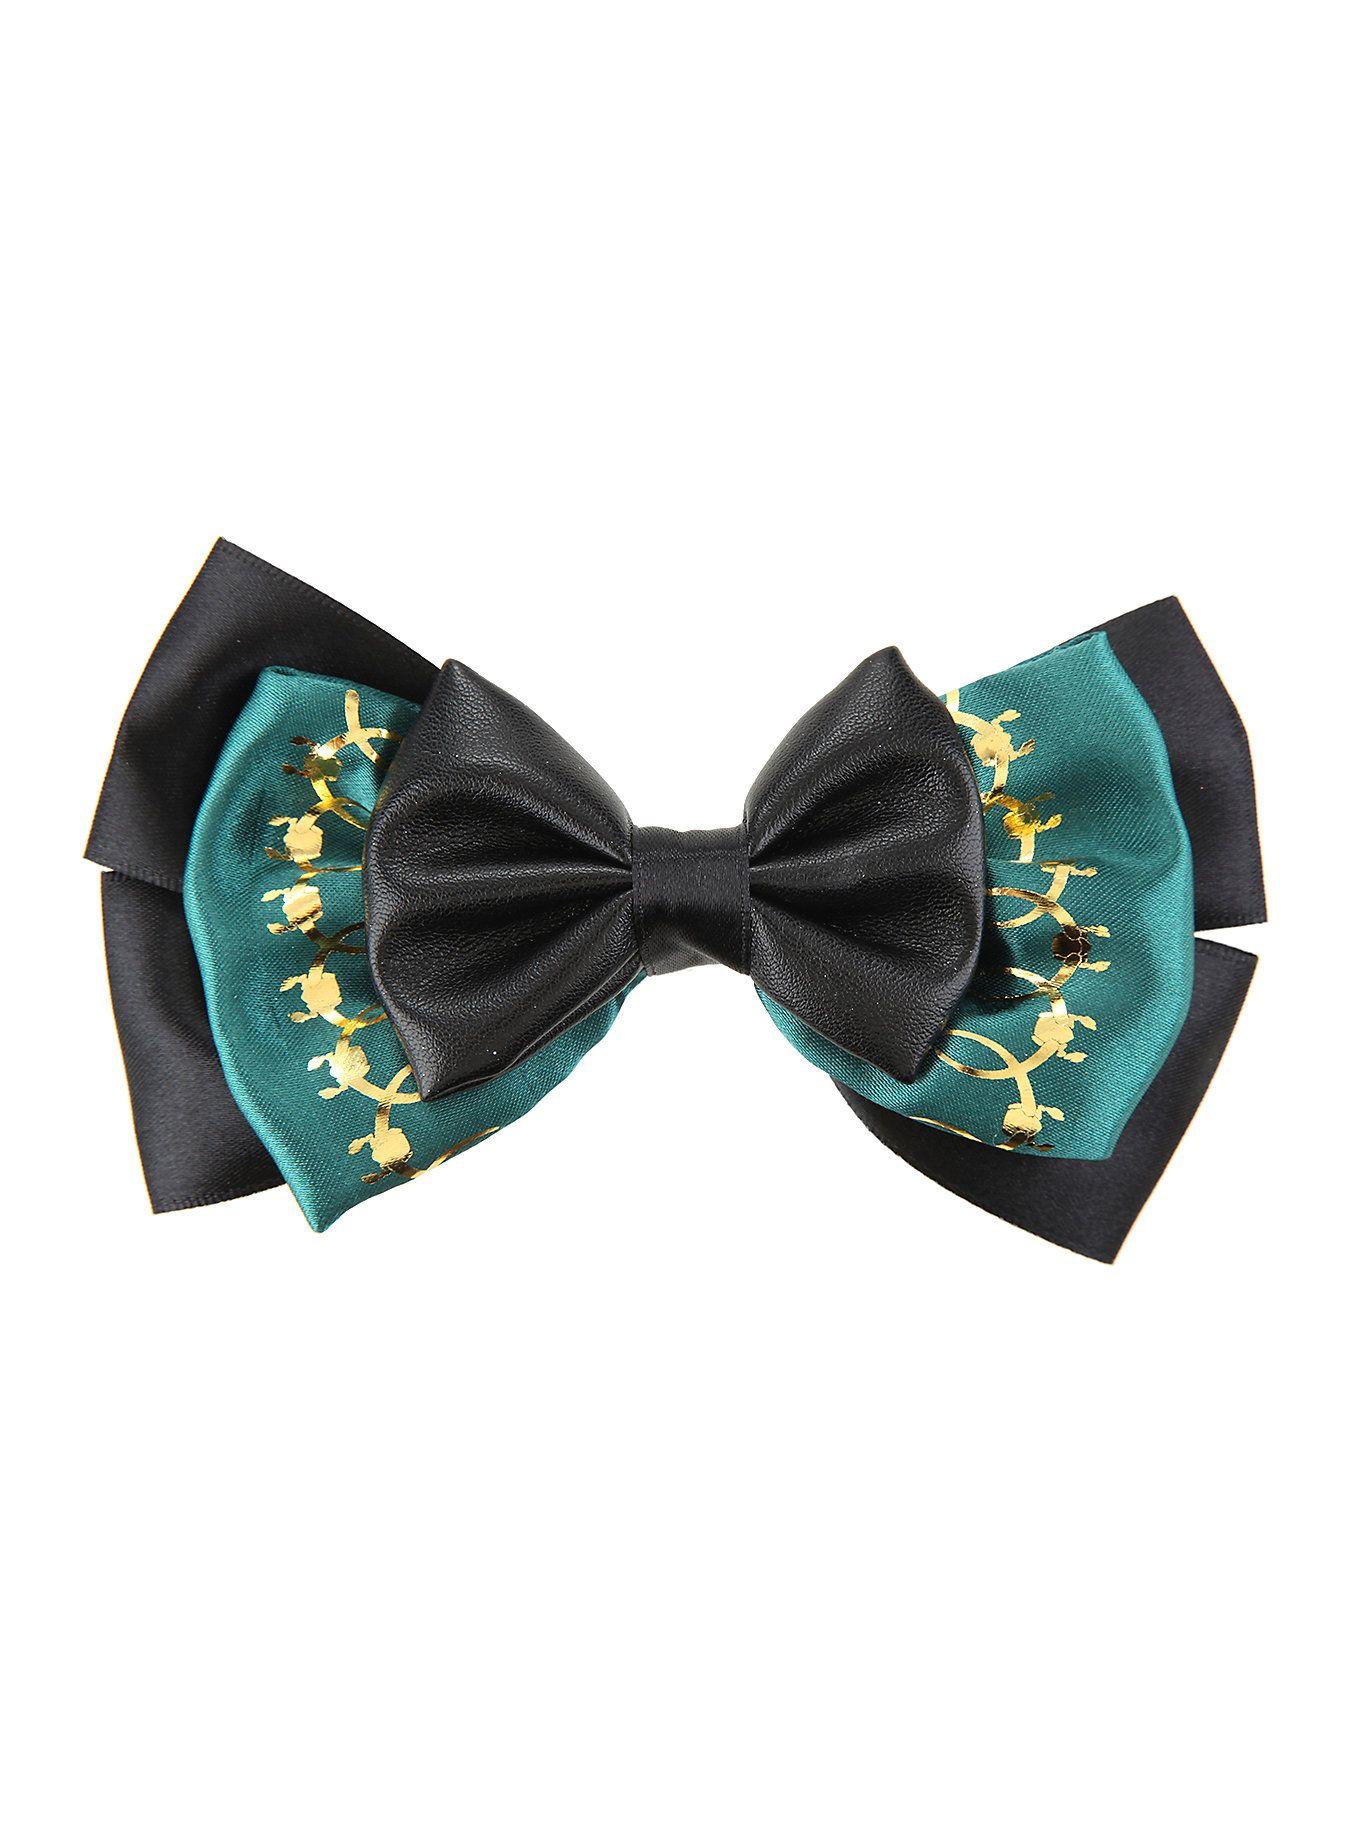 Black bow hair accessories - Marvel Loki Cosplay Hair Bow Hot Topic